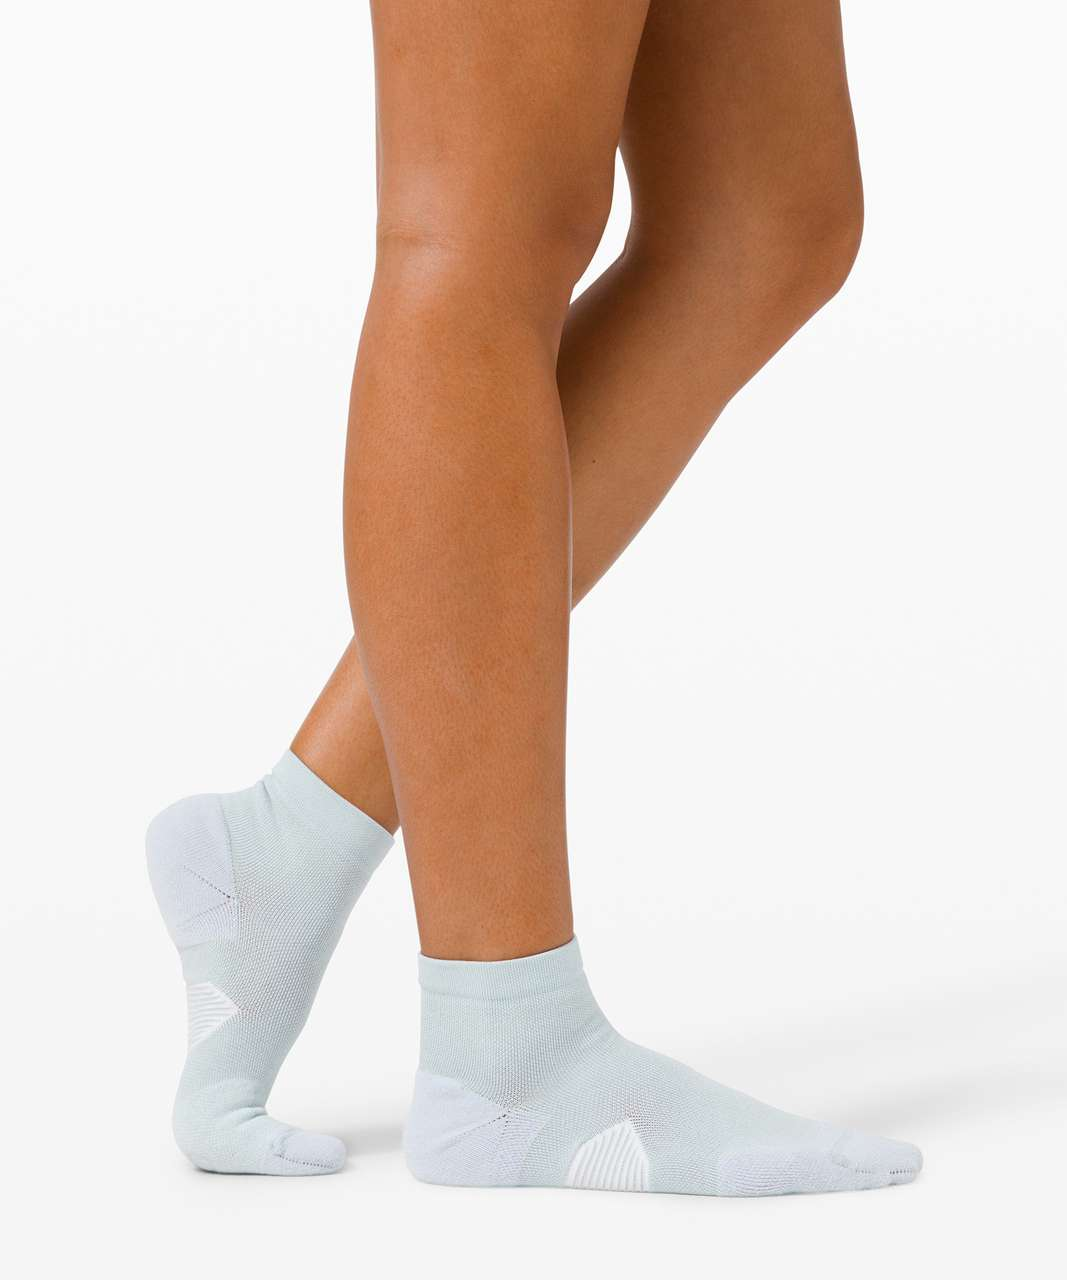 Lululemon Speed Ankle Sock *Silver - Daydream / White